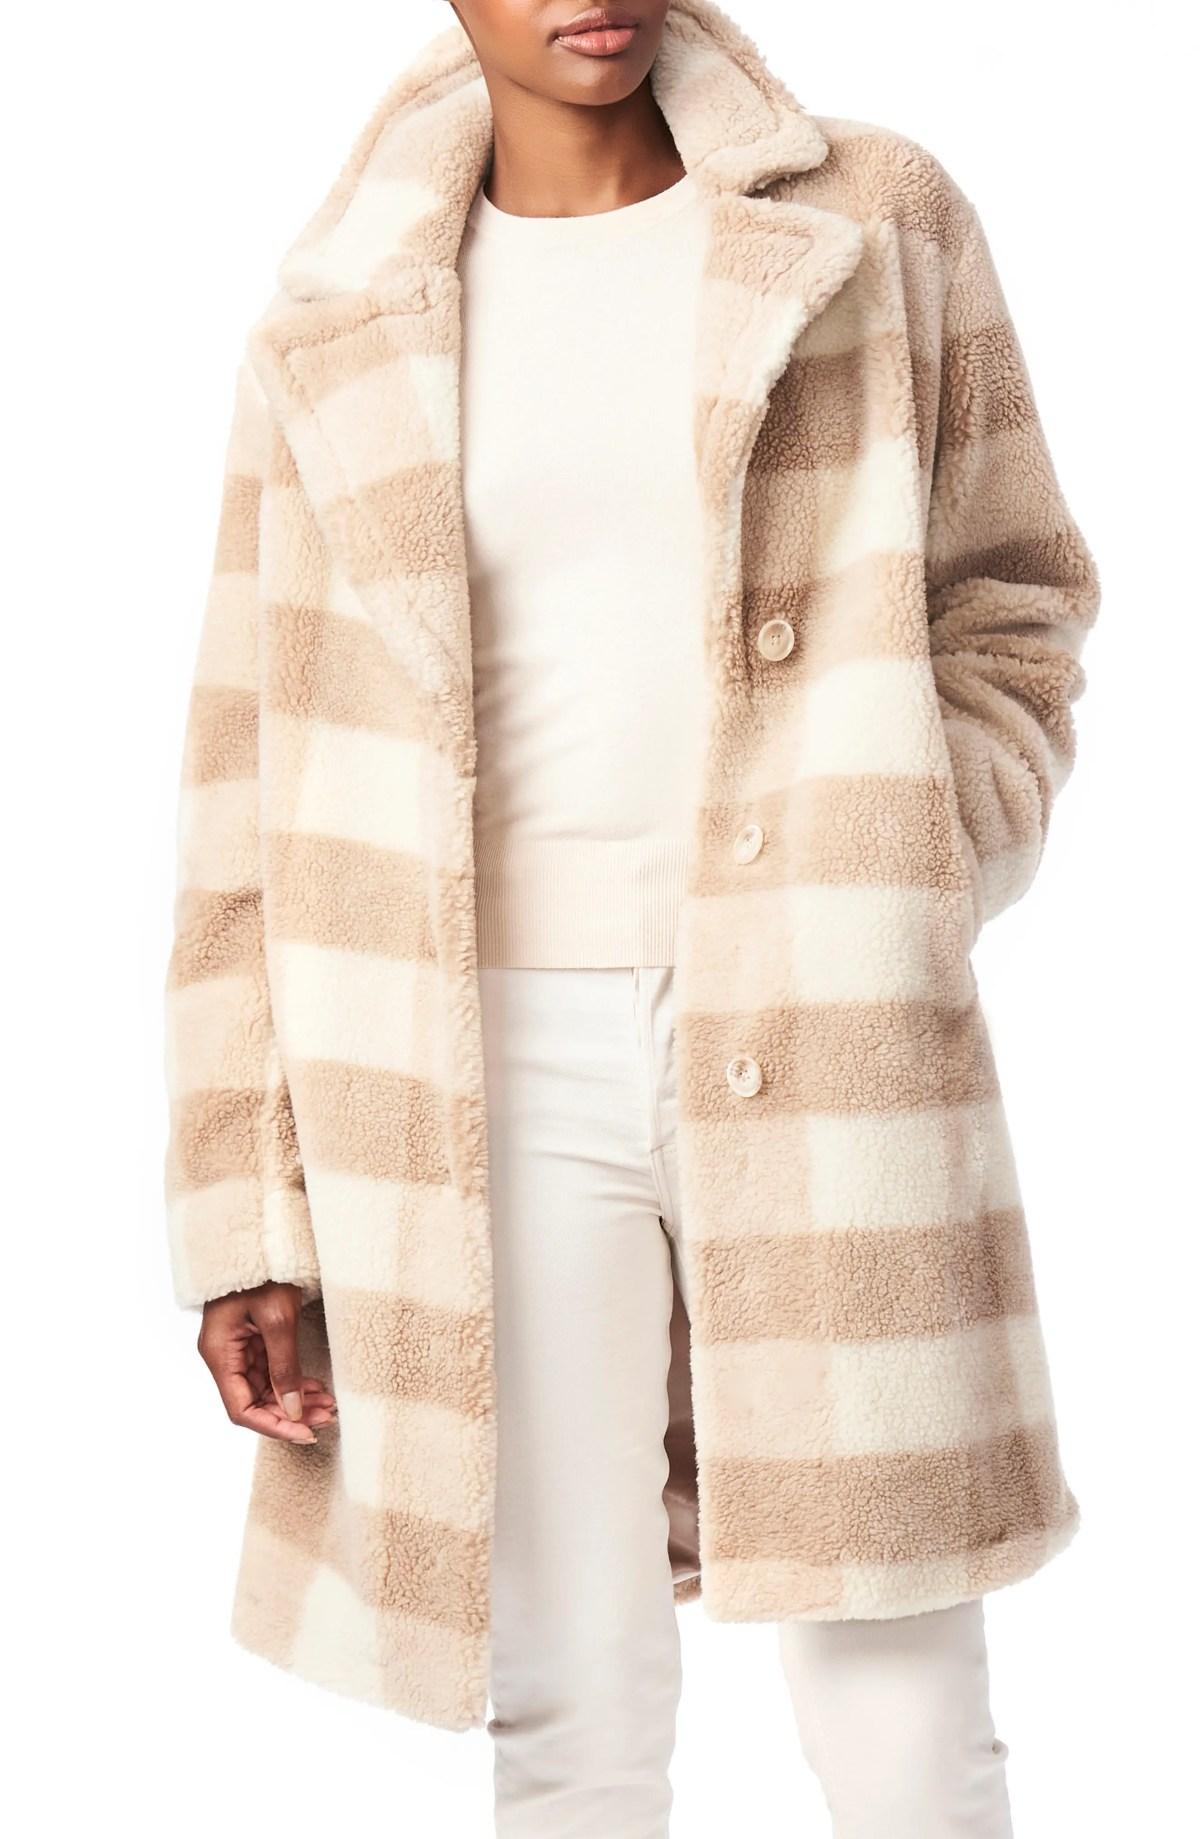 BERNARDO Check Teddy Faux Fur Coat, Main, color, BEIGE PLAID